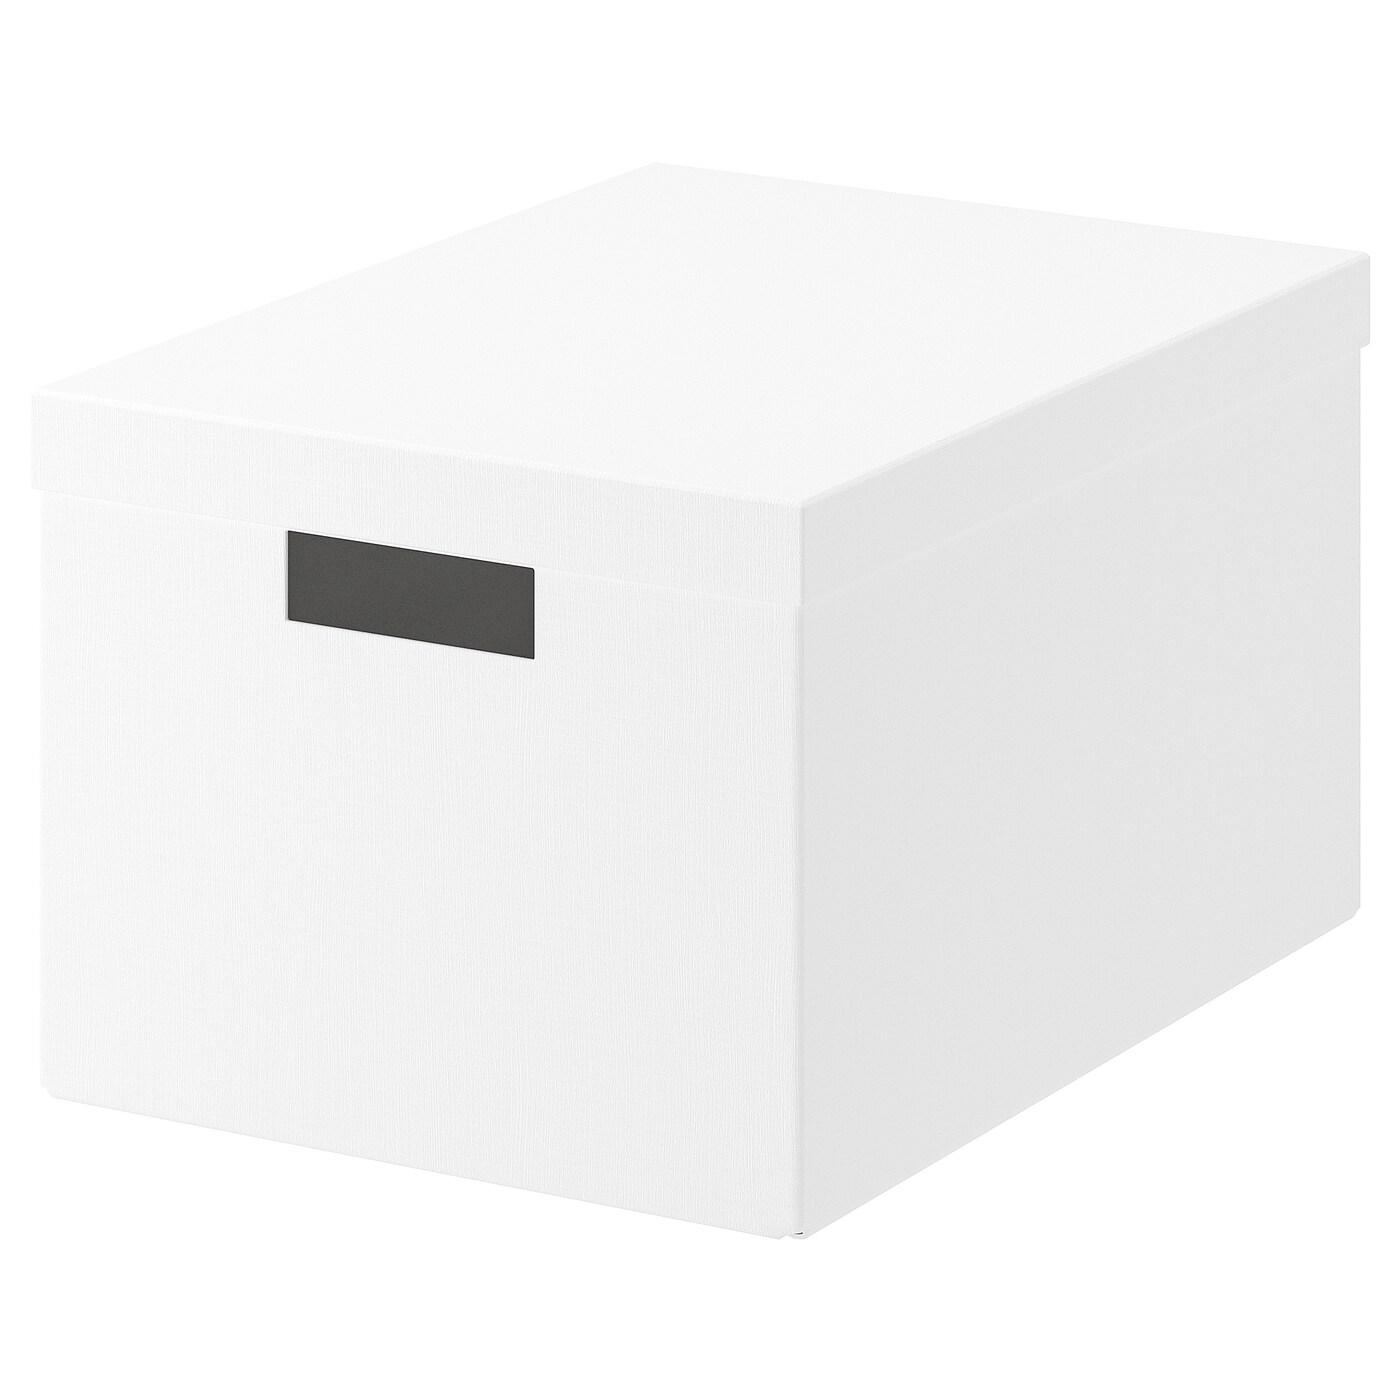 IKEA BATTING Schachteln 3er-Set Aufbewahrungsbox Kiste schwarz Boxen Karton